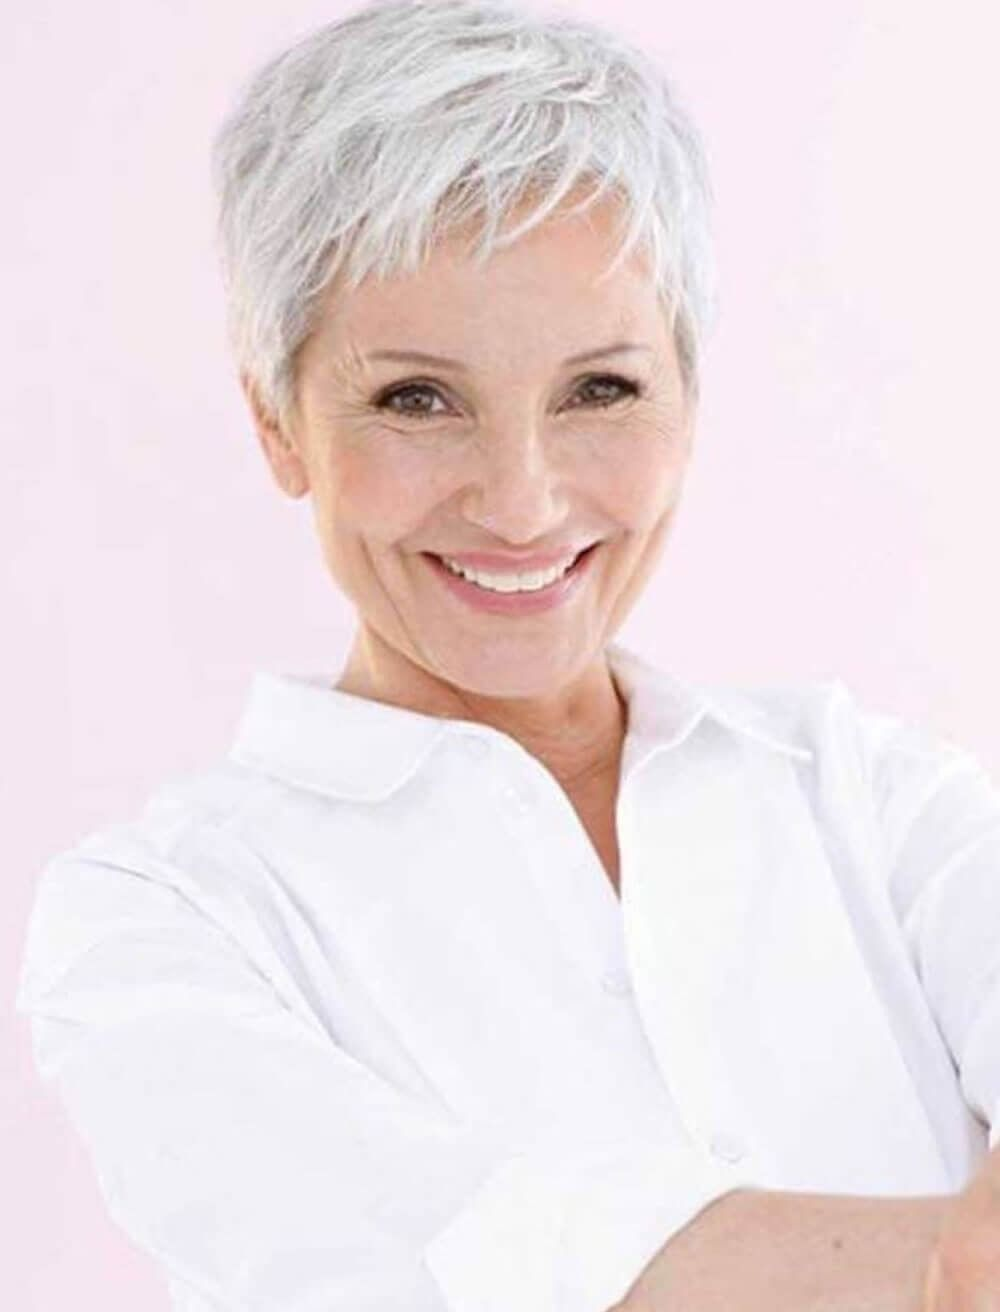 Kapsels Oudere Dames 2018 In 2020 Korte Kapsels Voor Oudere Dames Grijs Kort Kapsel Kapsels Voor Kort Haar